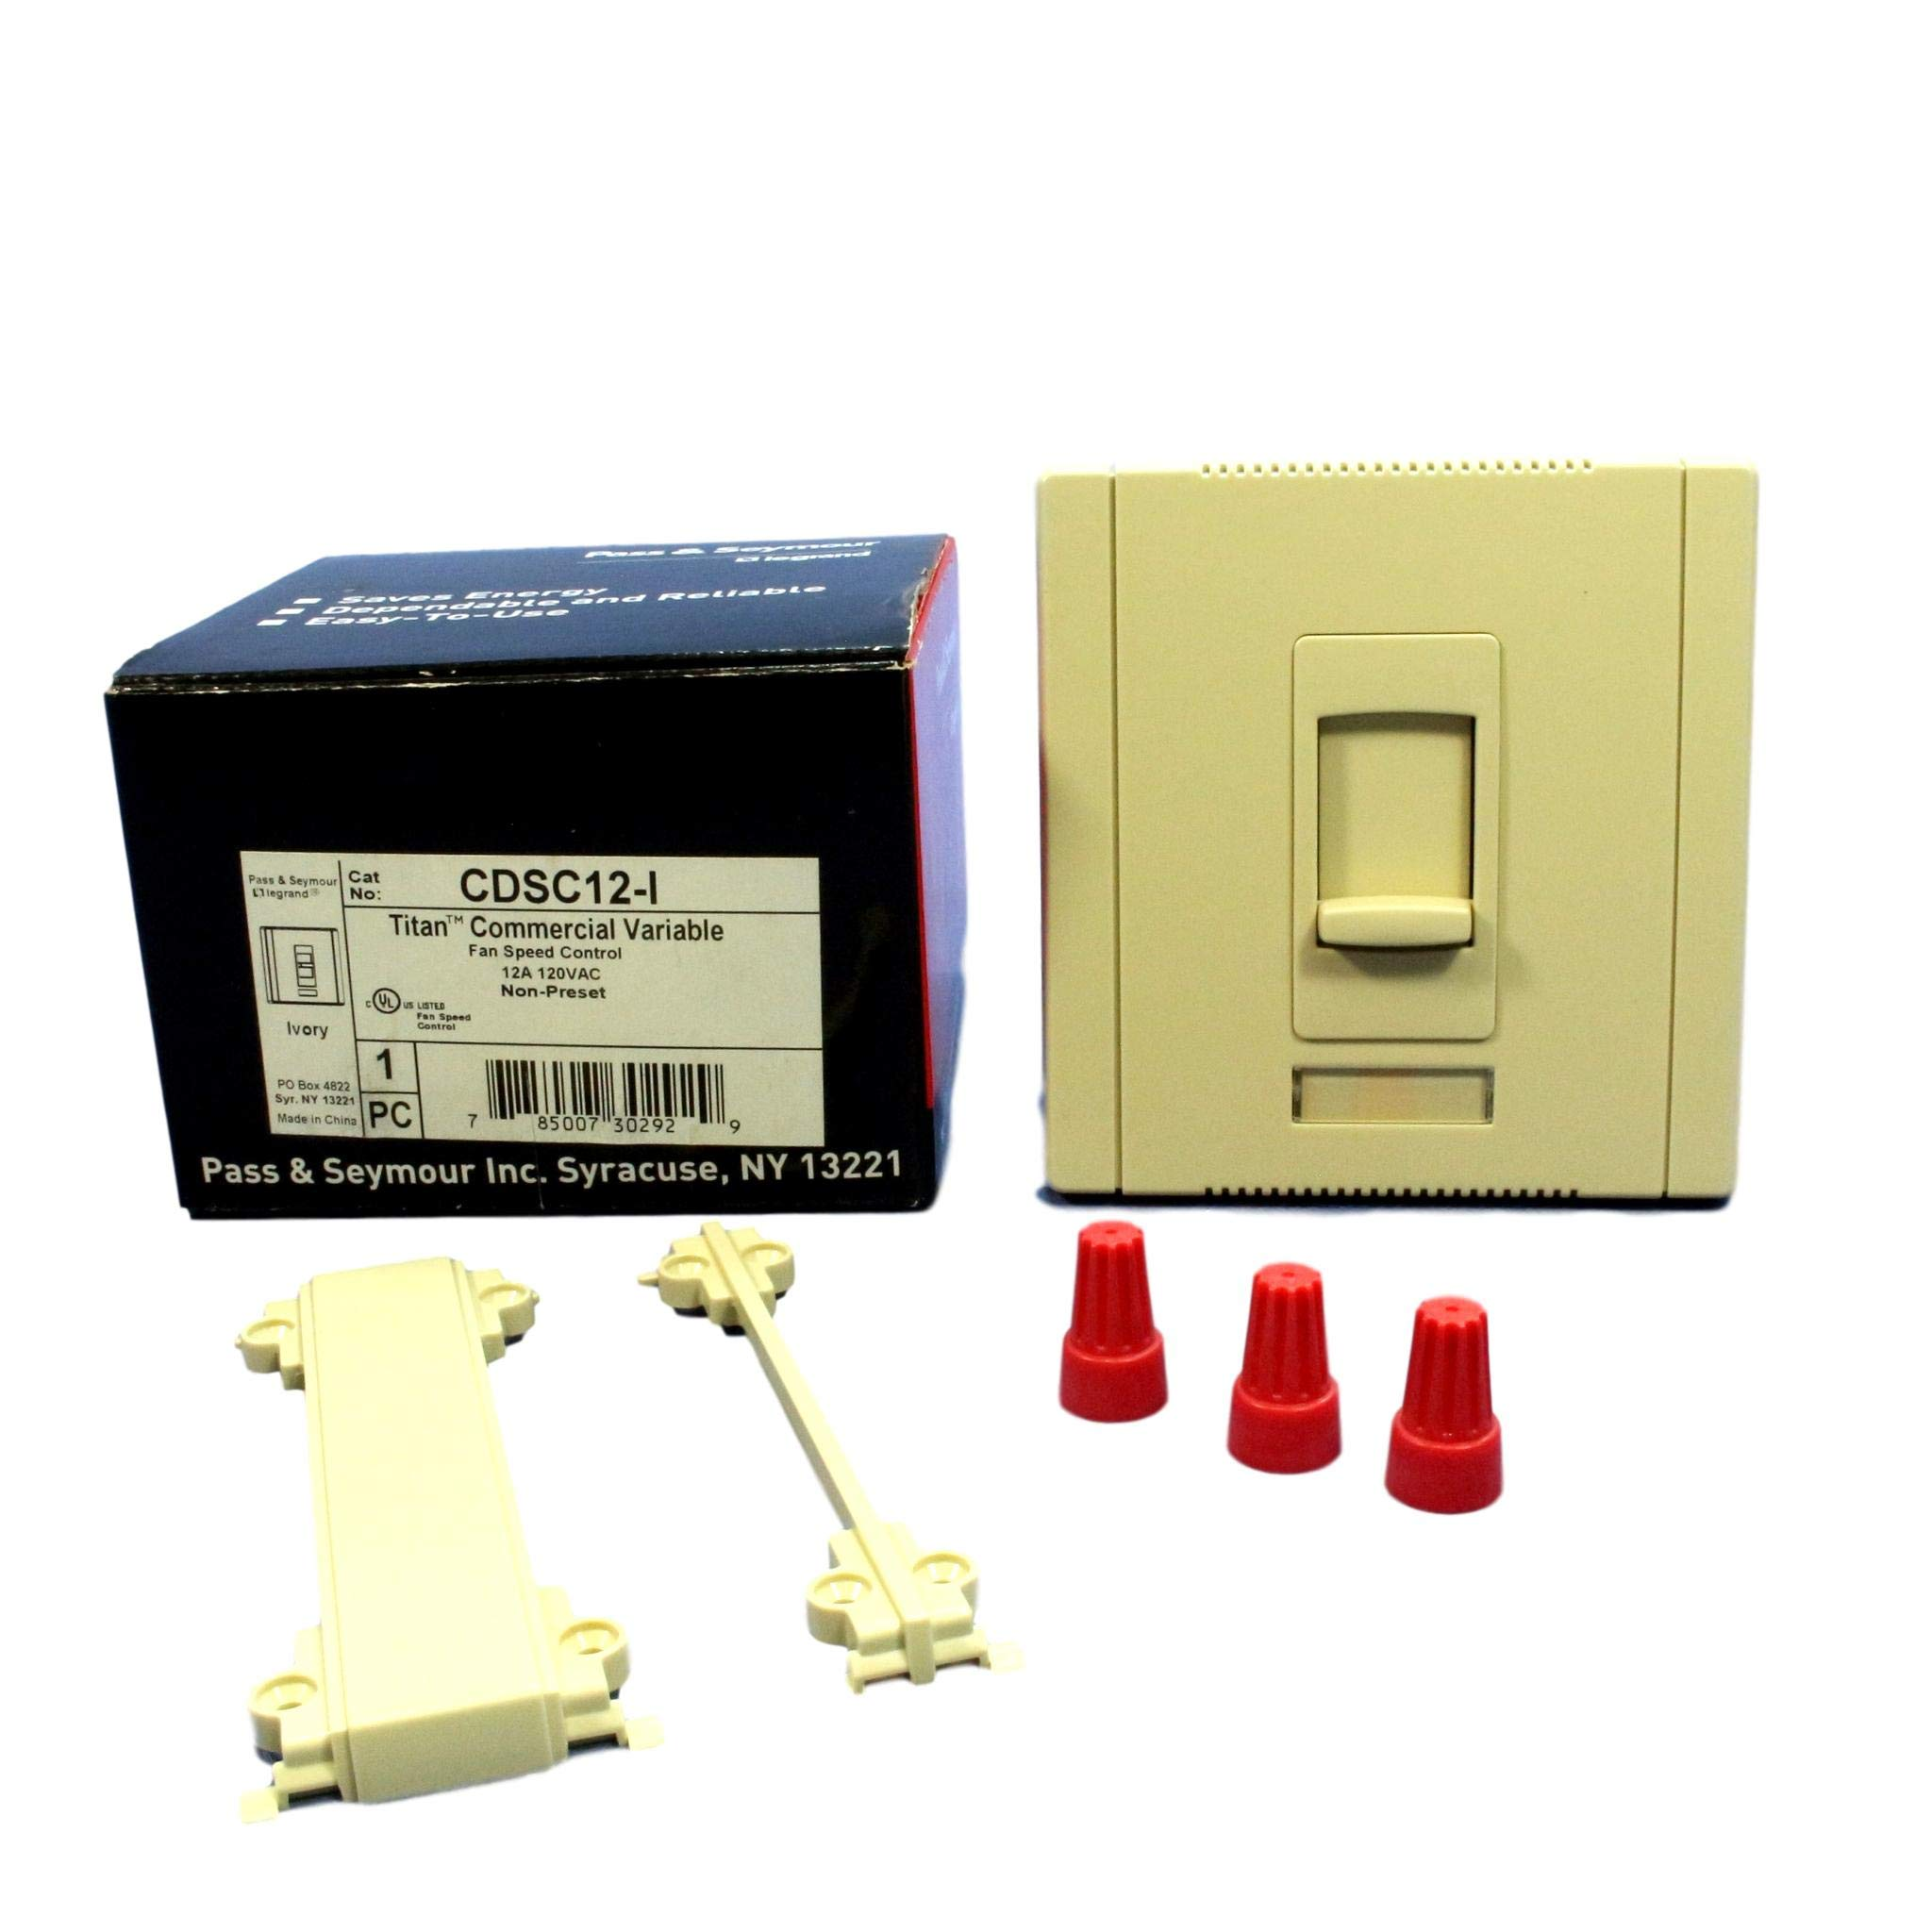 Pass & Seymour CDSC12-I Ivory 12A 120V Single Pole Titan Series Fan Speed Control